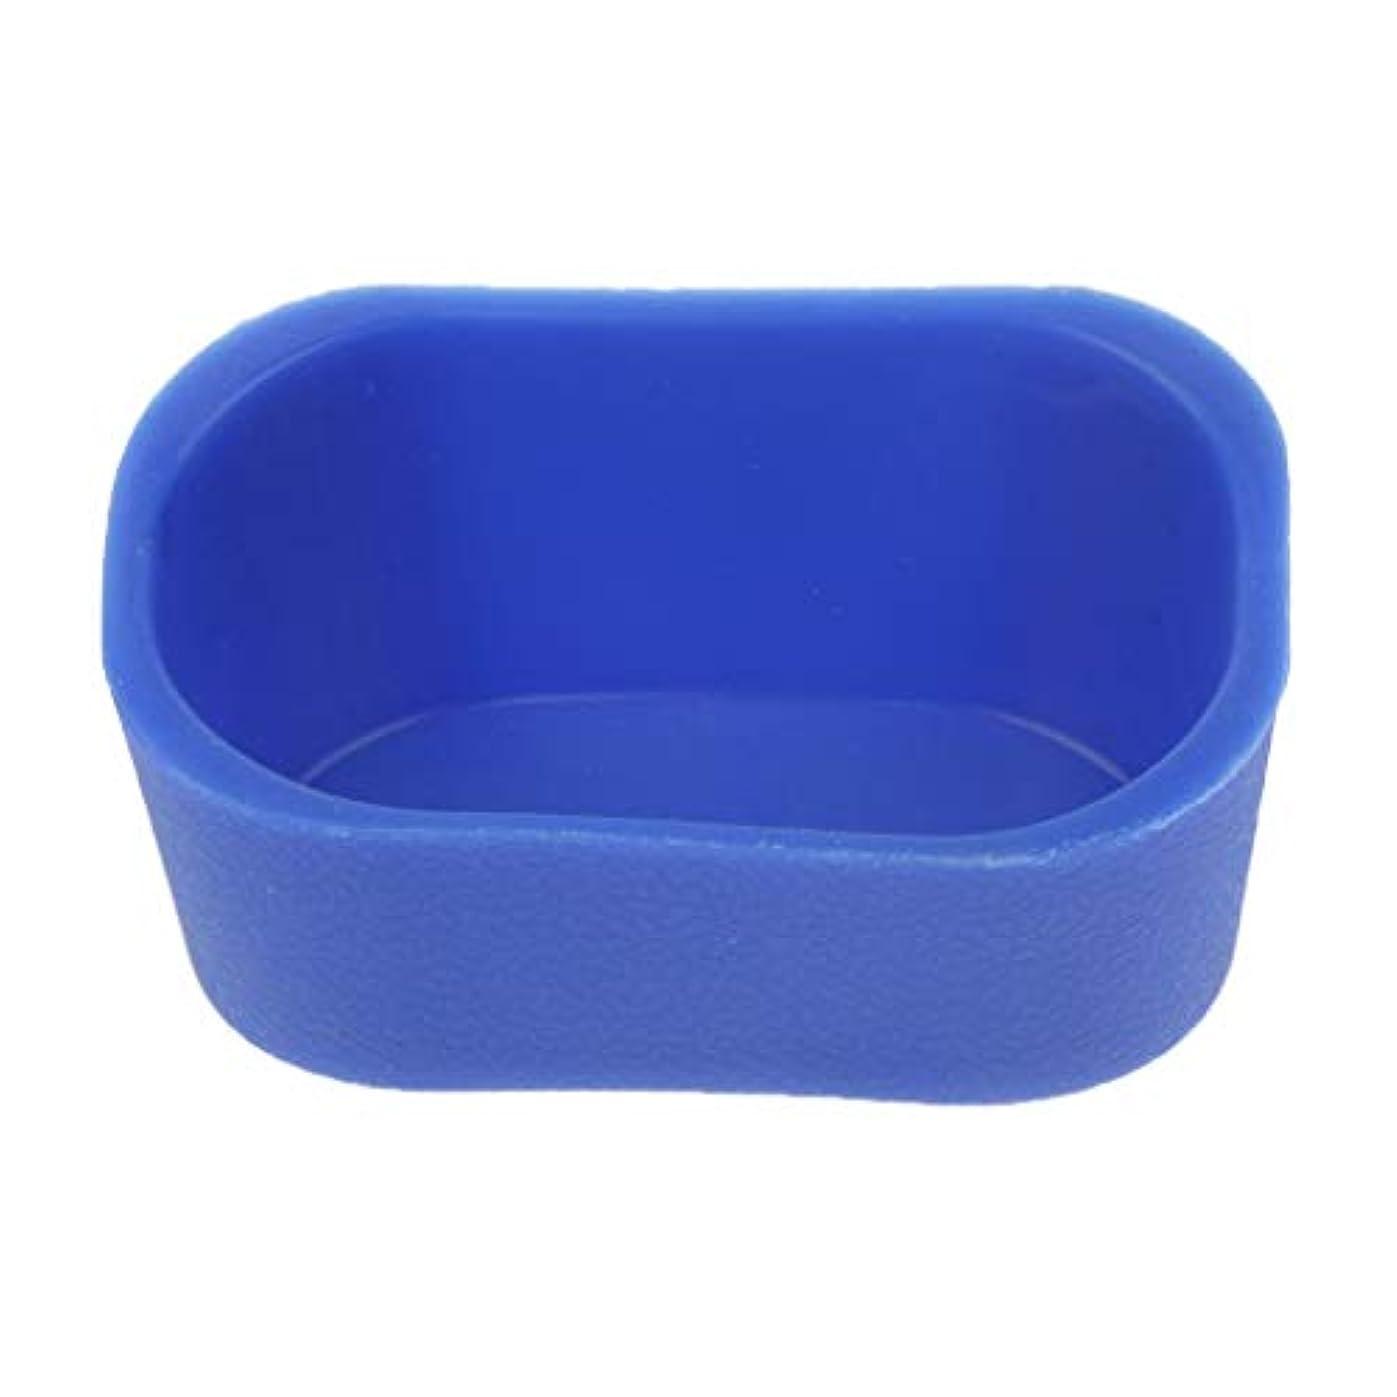 D DOLITY シャンプーボウル ピロー ネックレス クッション 高品質 5色選べ - 青